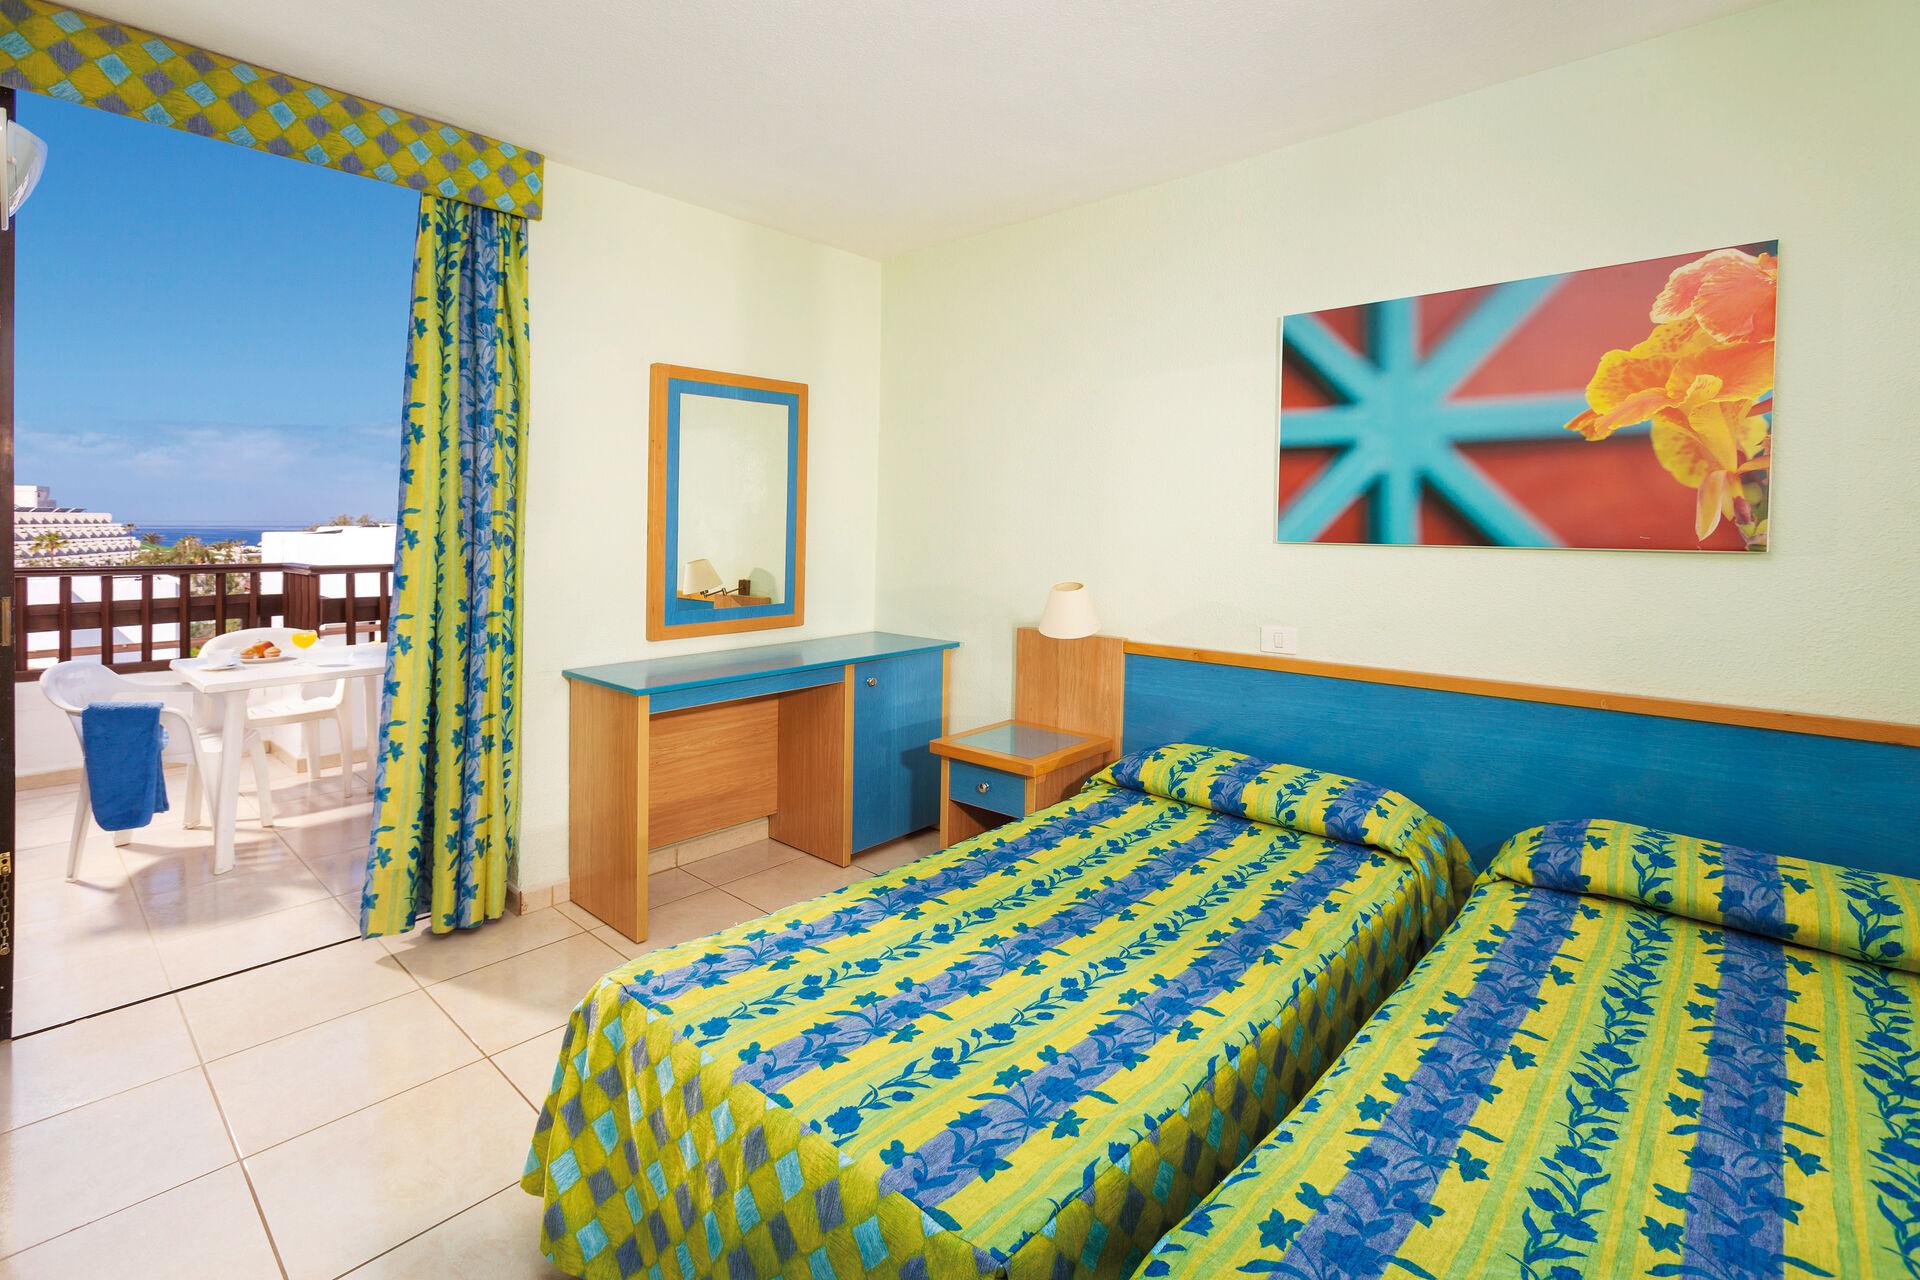 Canaries - Tenerife - Espagne - Hôtel Paraiso del Sol 2*